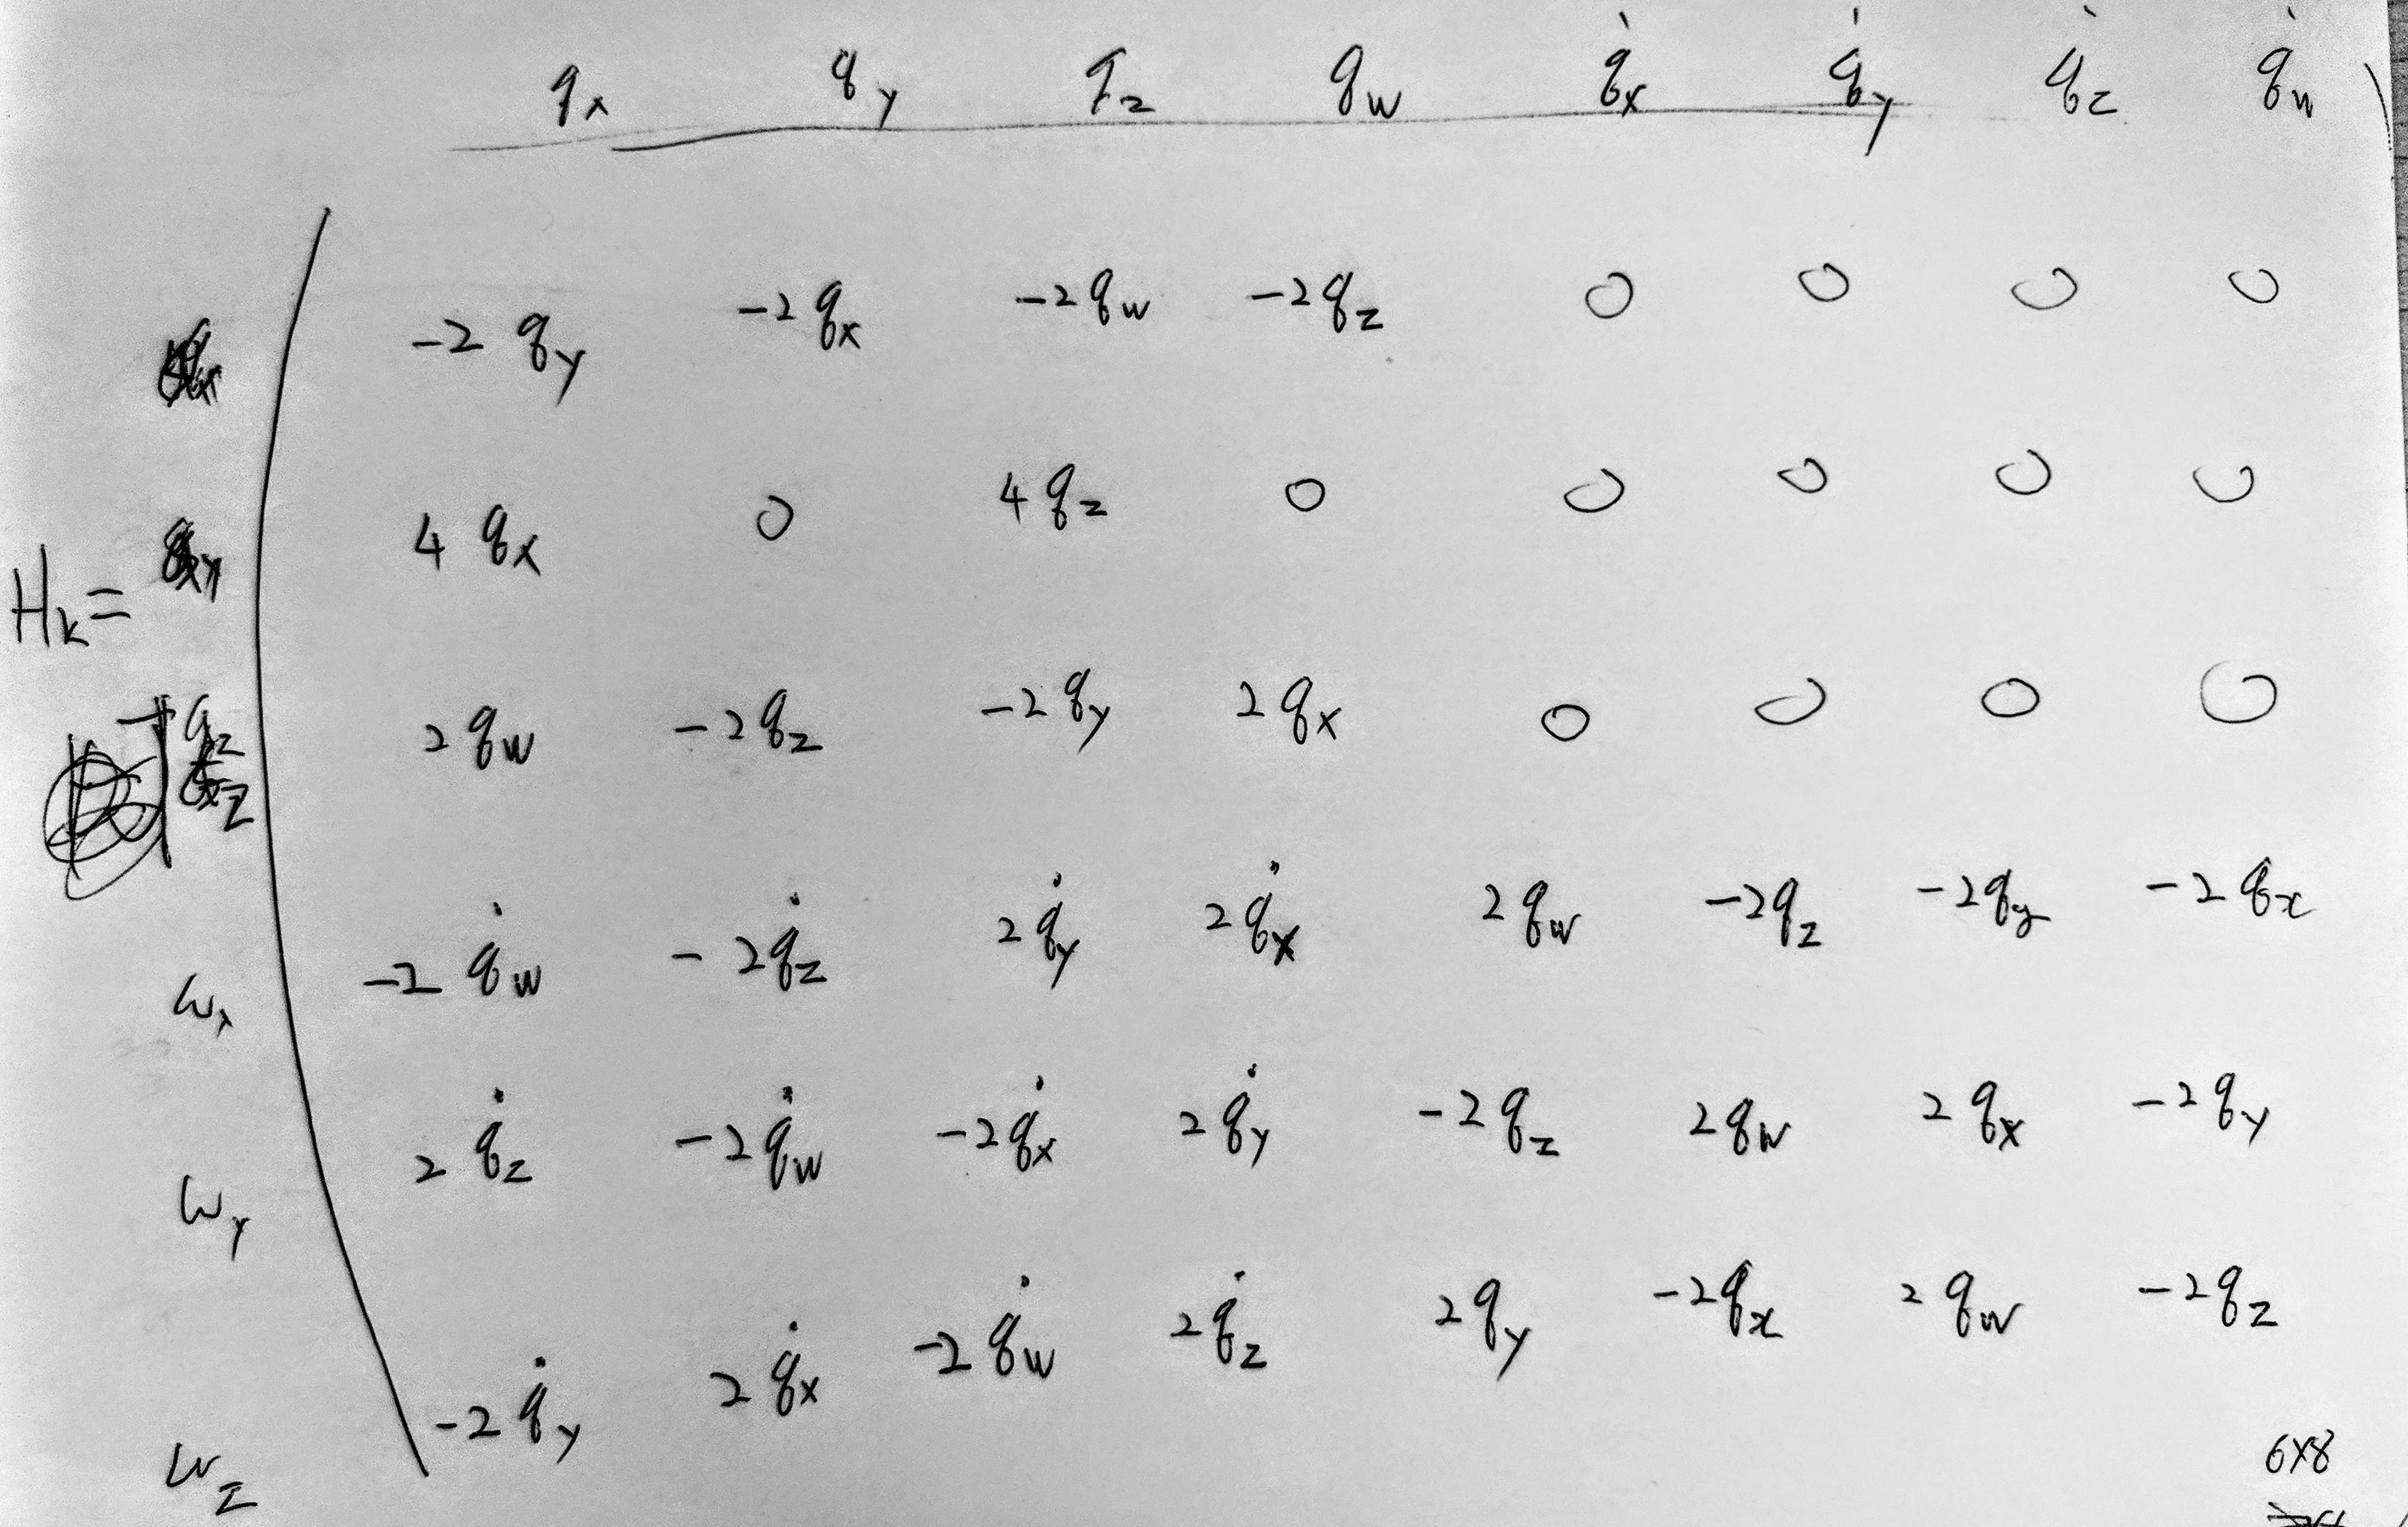 VR mathematics: opengl matrix, transform, quaternion, euler